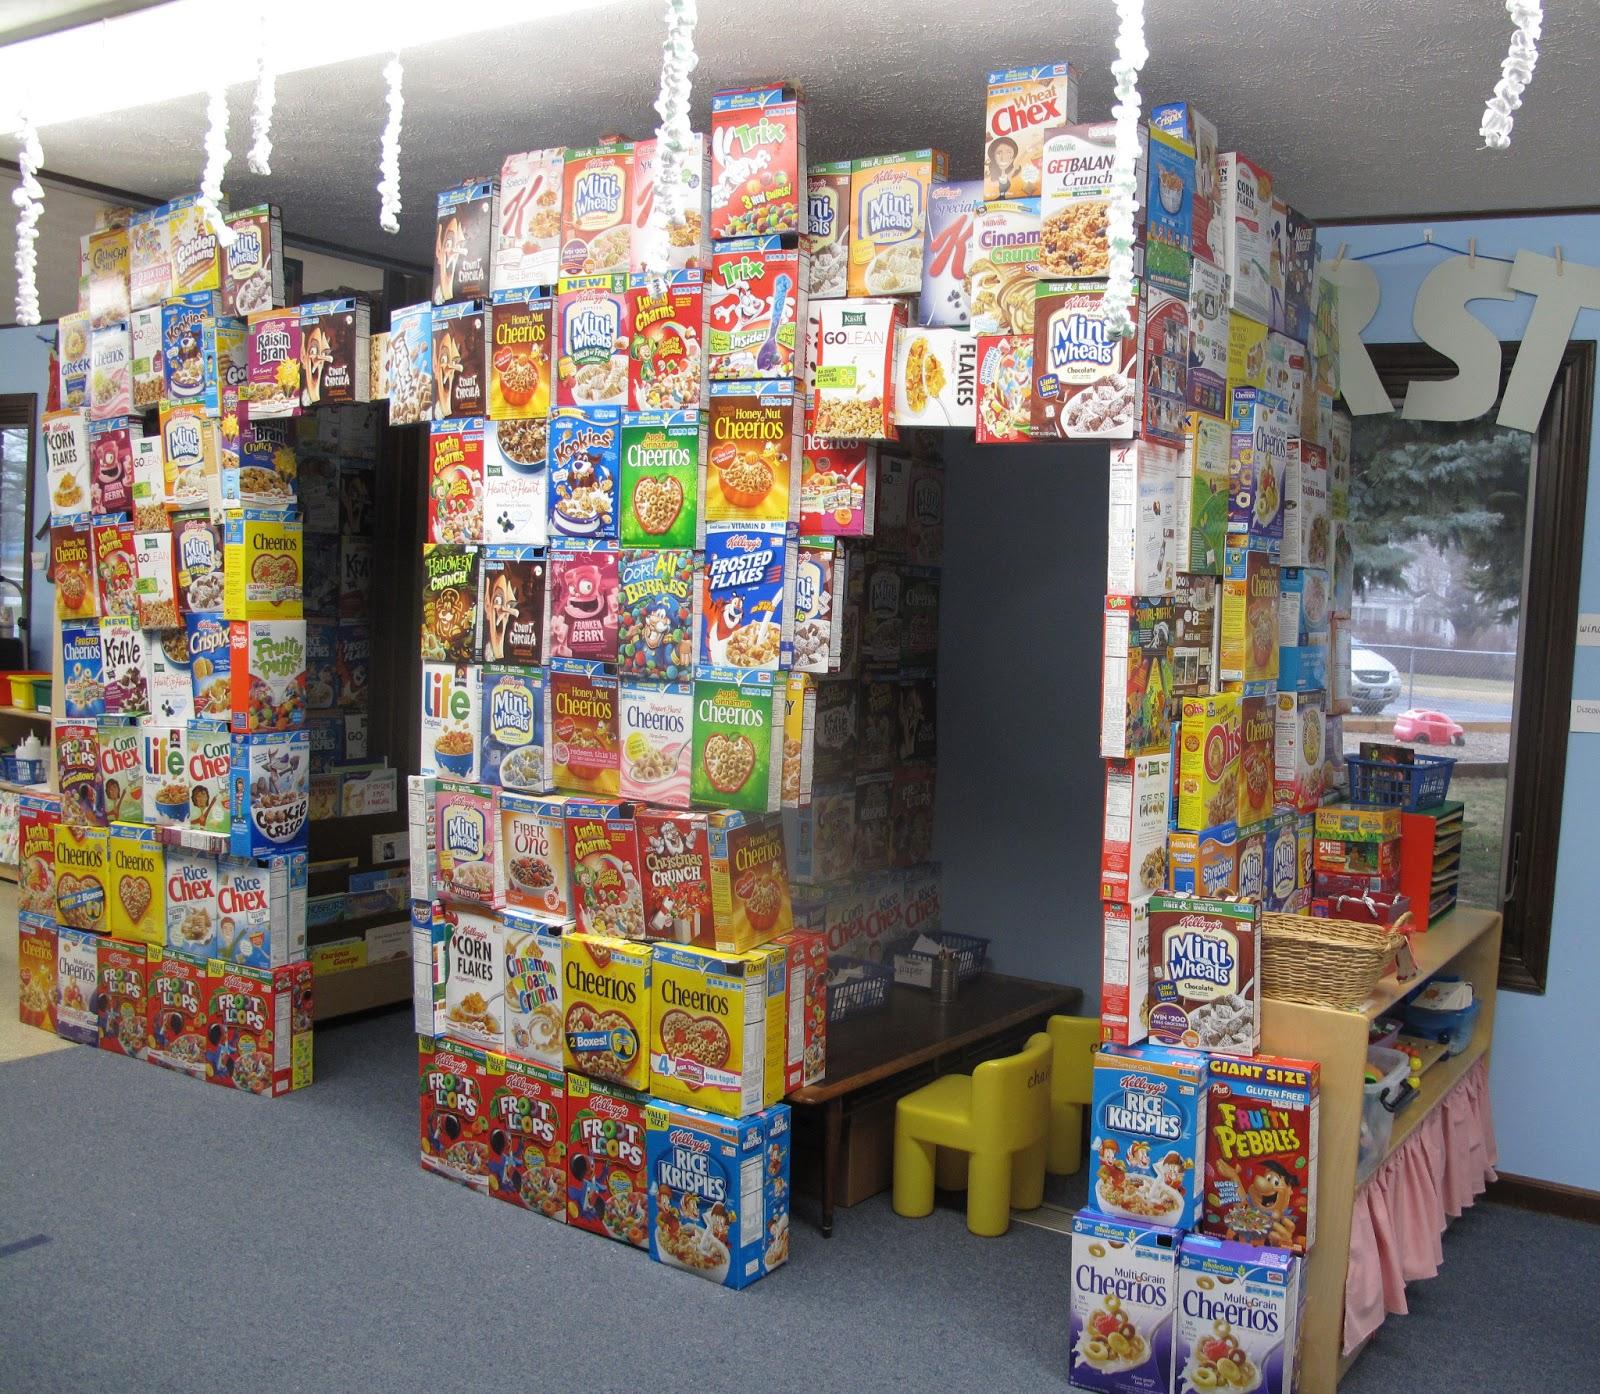 metamora community preschool my impenetrable cereal box fort